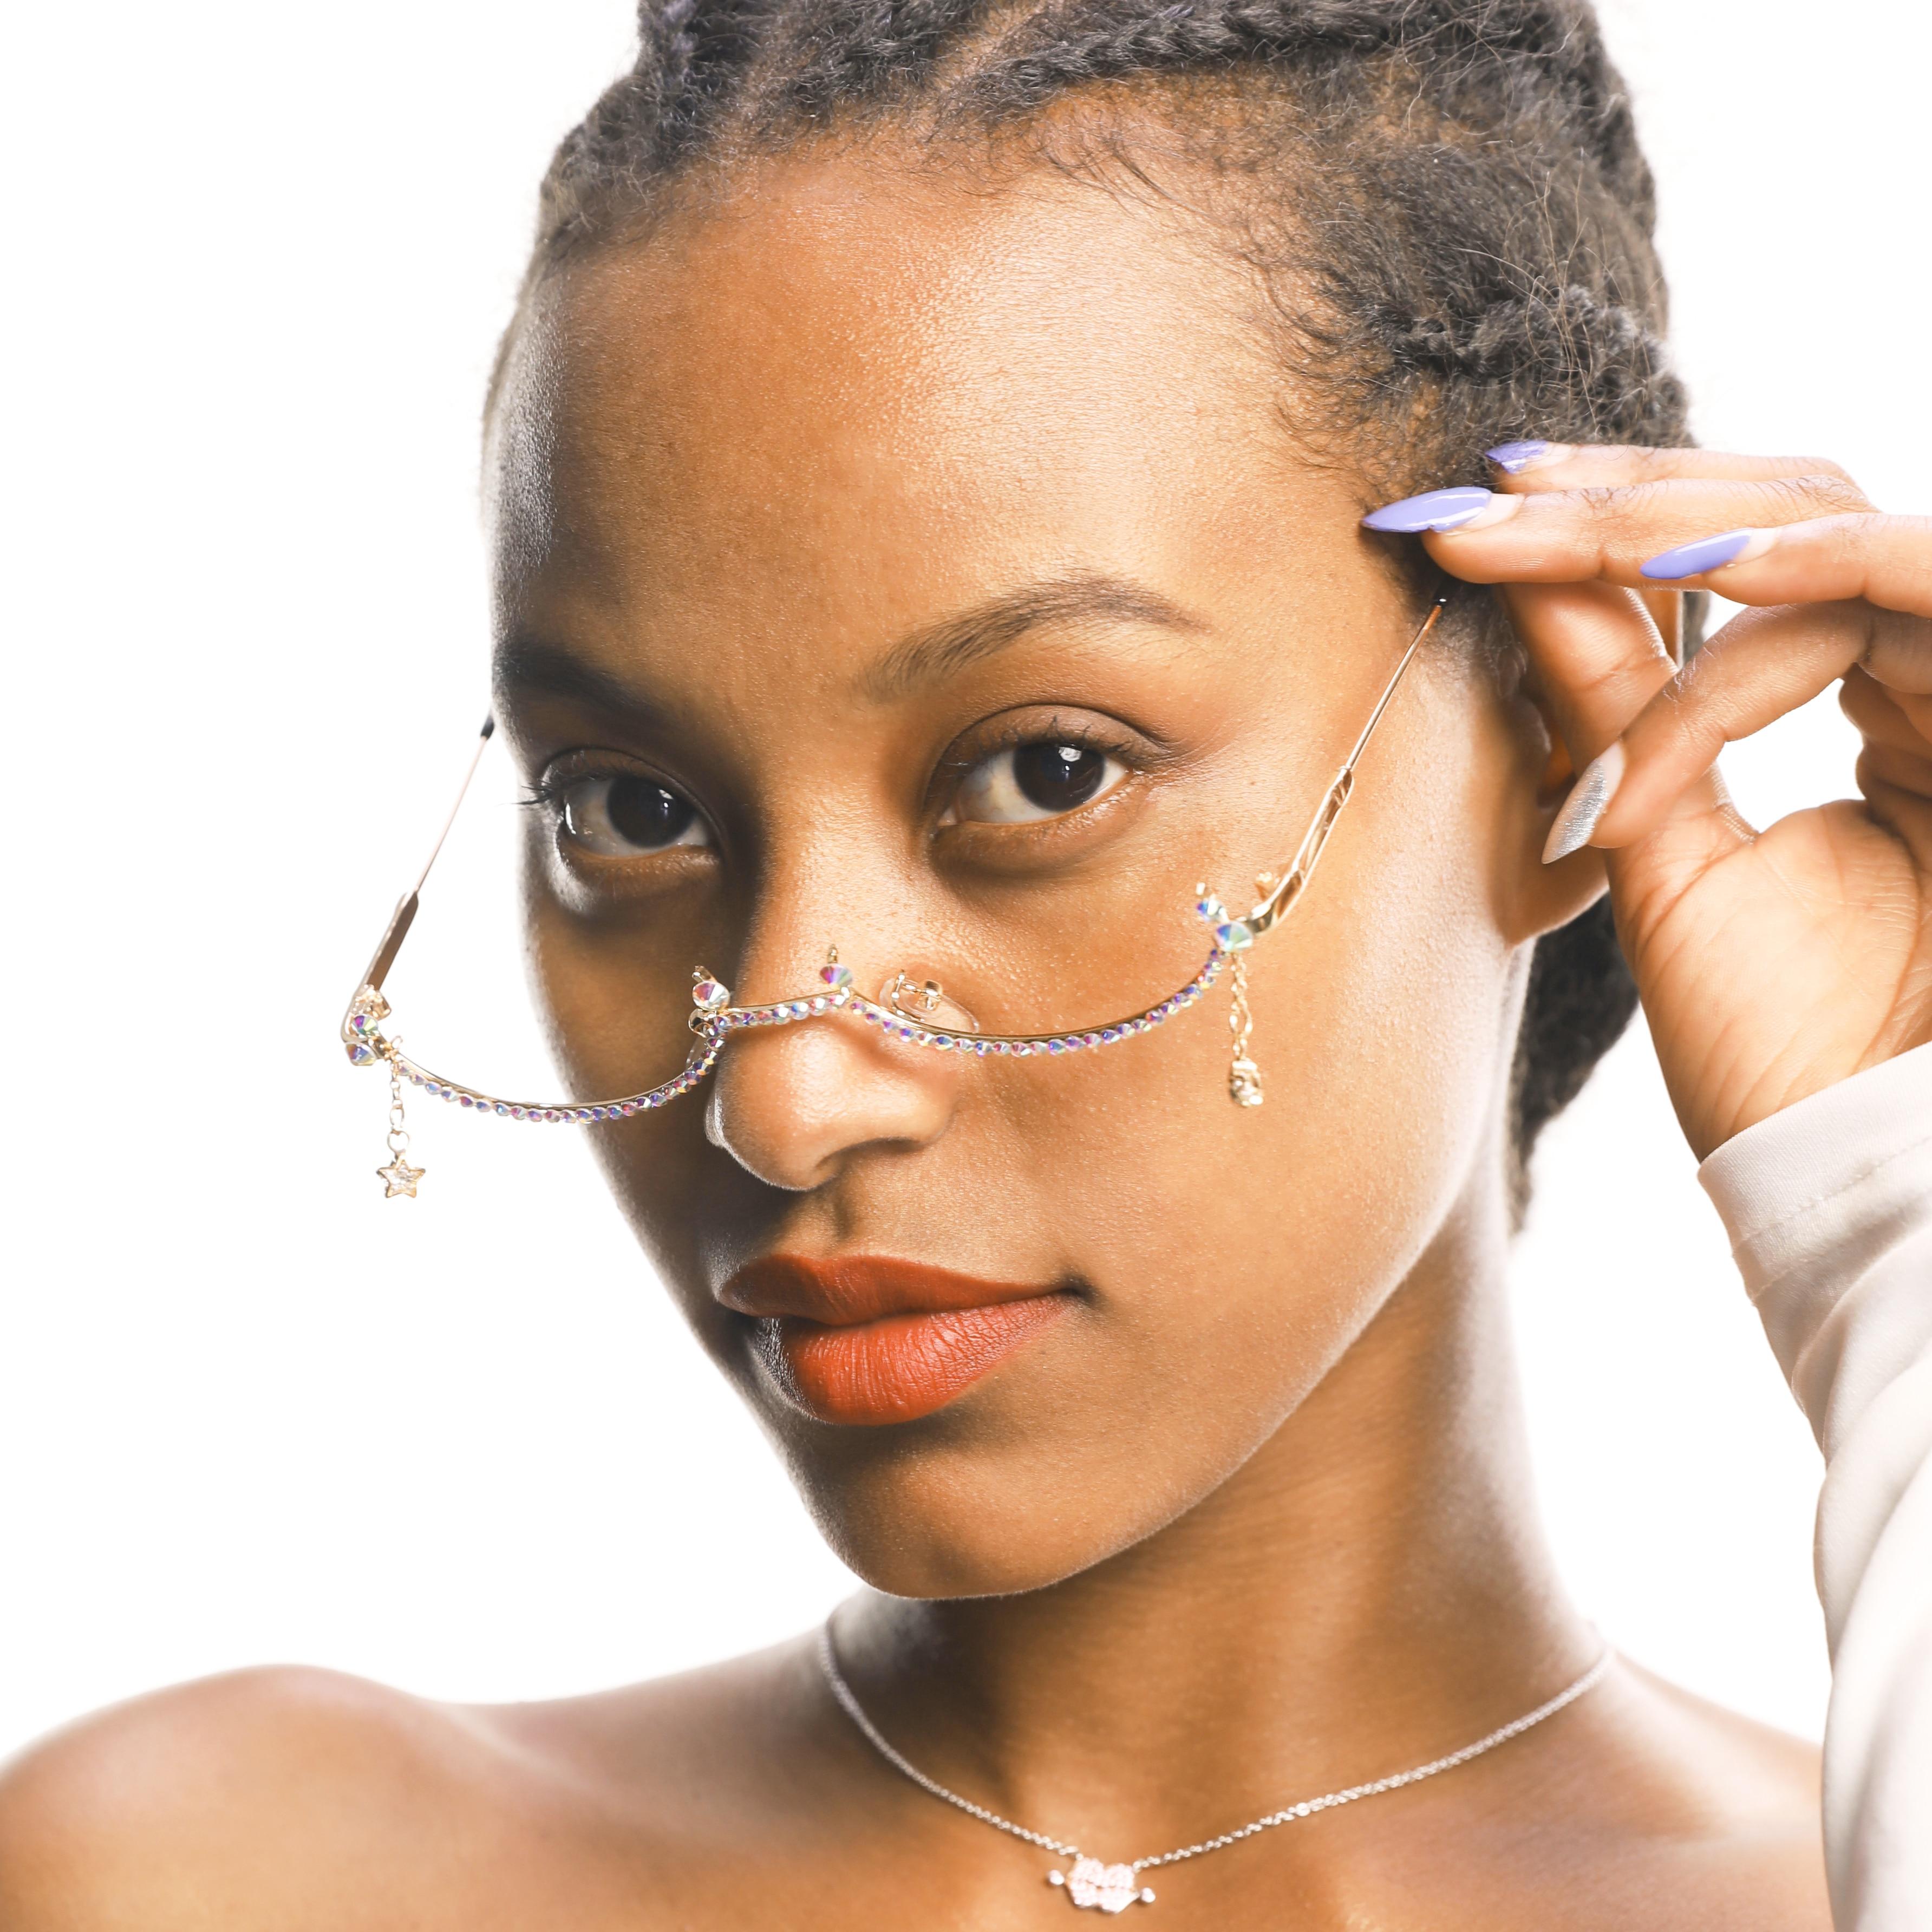 2019 Fashion Eyeglasses Alloy Frame For Women Water Drop Lensless Chain Pendant Decoration Half Frame Luxury Diamond Glasses